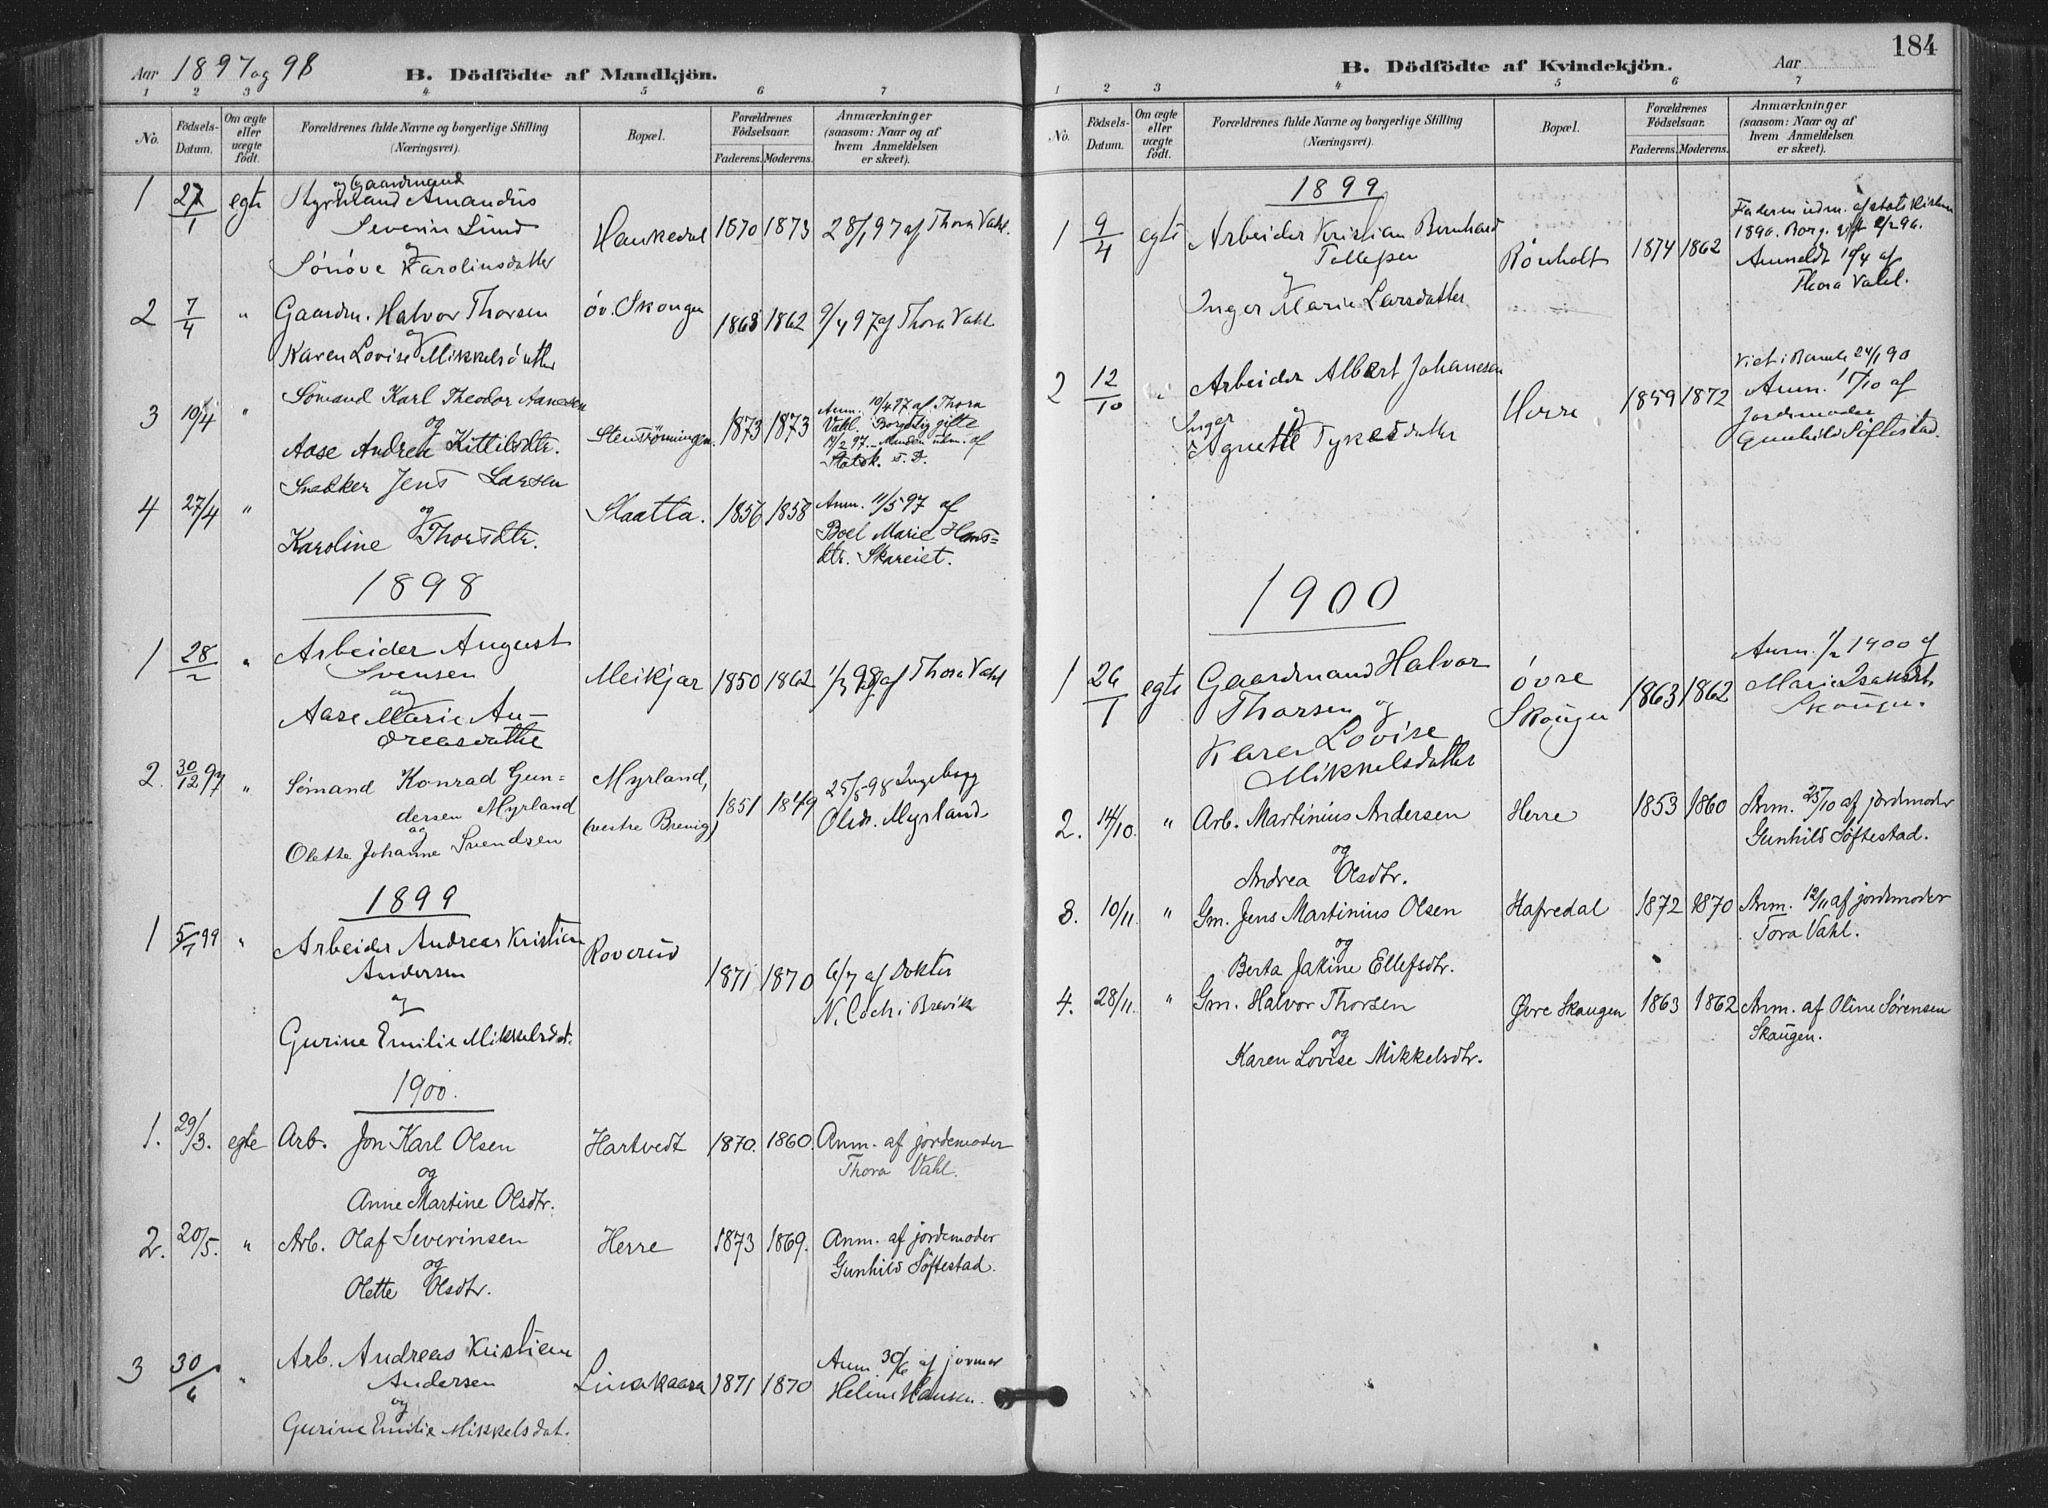 SAKO, Bamble kirkebøker, F/Fa/L0008: Ministerialbok nr. I 8, 1888-1900, s. 184